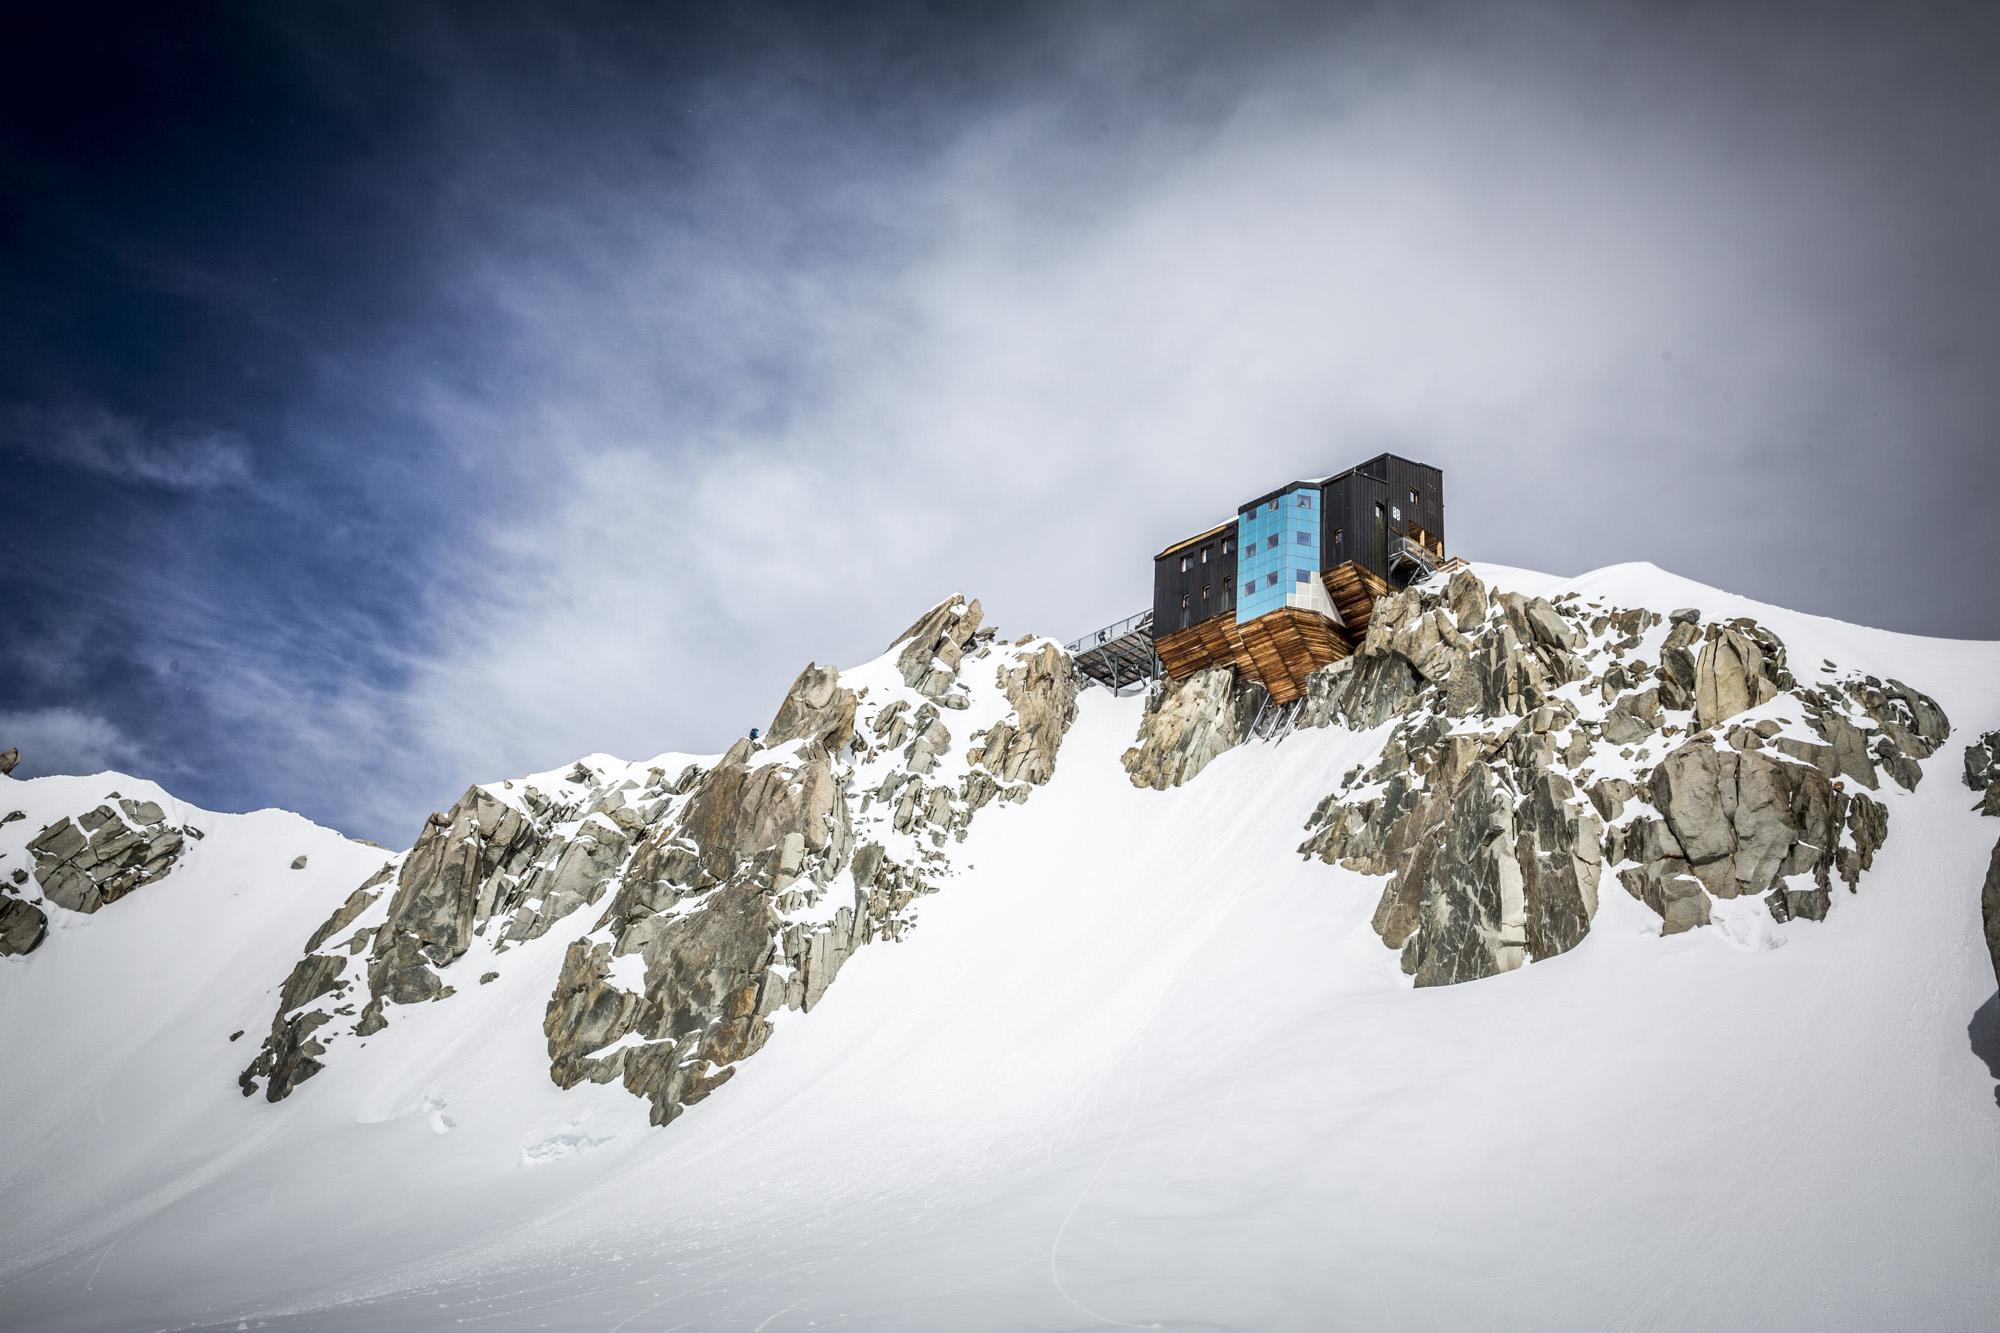 arcteryx alpine academy